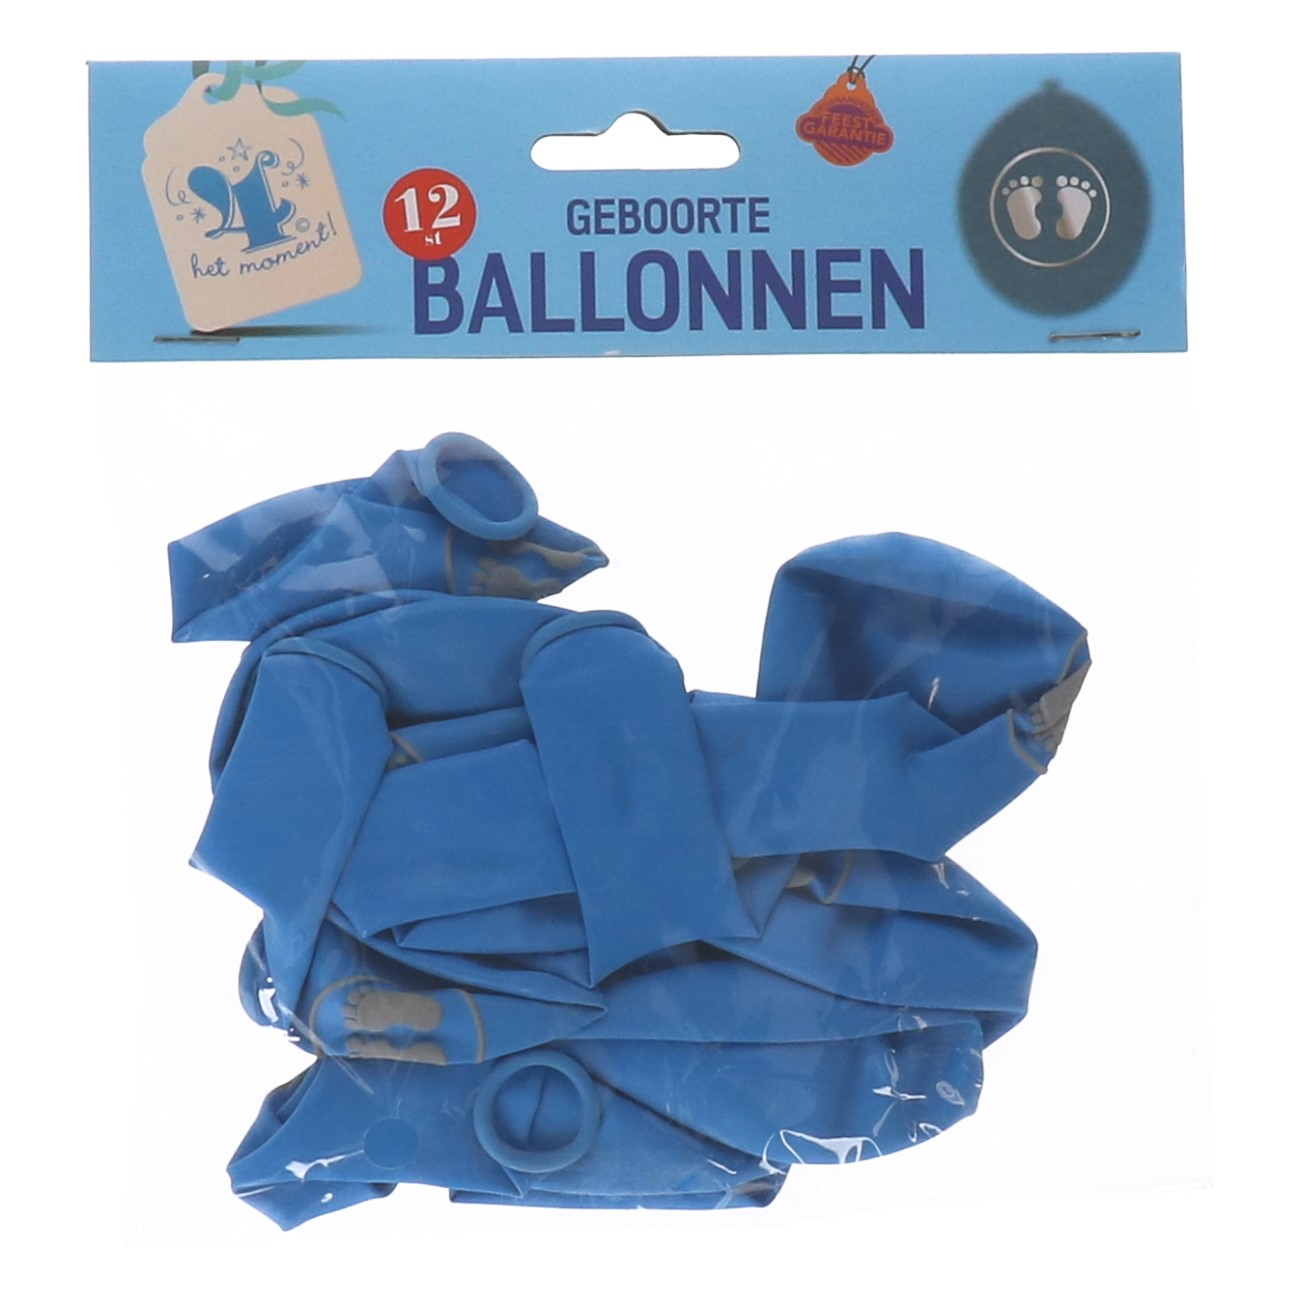 Ballonnen geboorte jongen 12 st